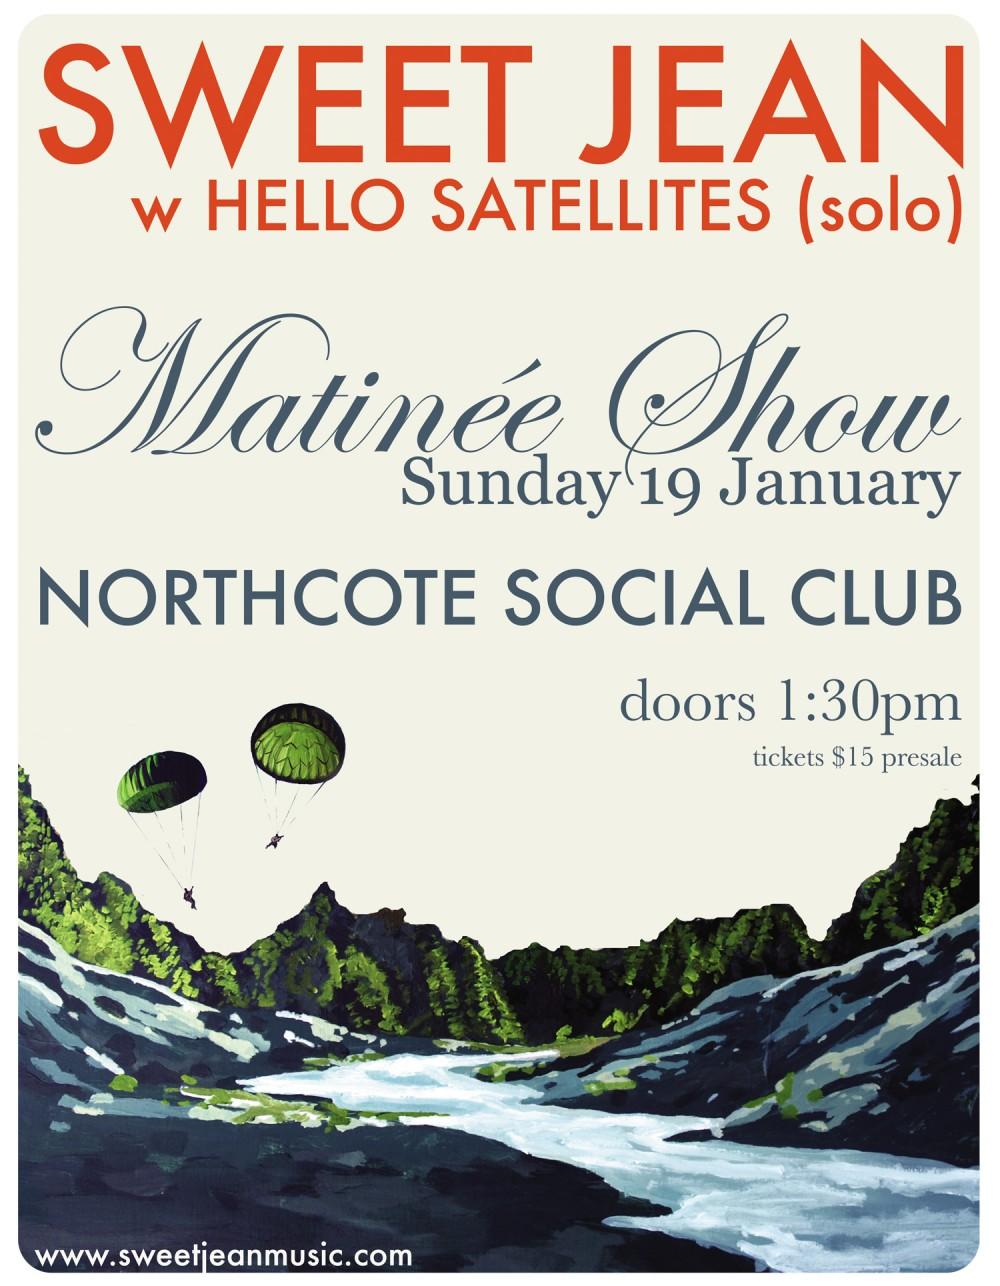 Sweet Jean @ Northcote Social Club, Melbourne (Sun 19 Jan 2014)